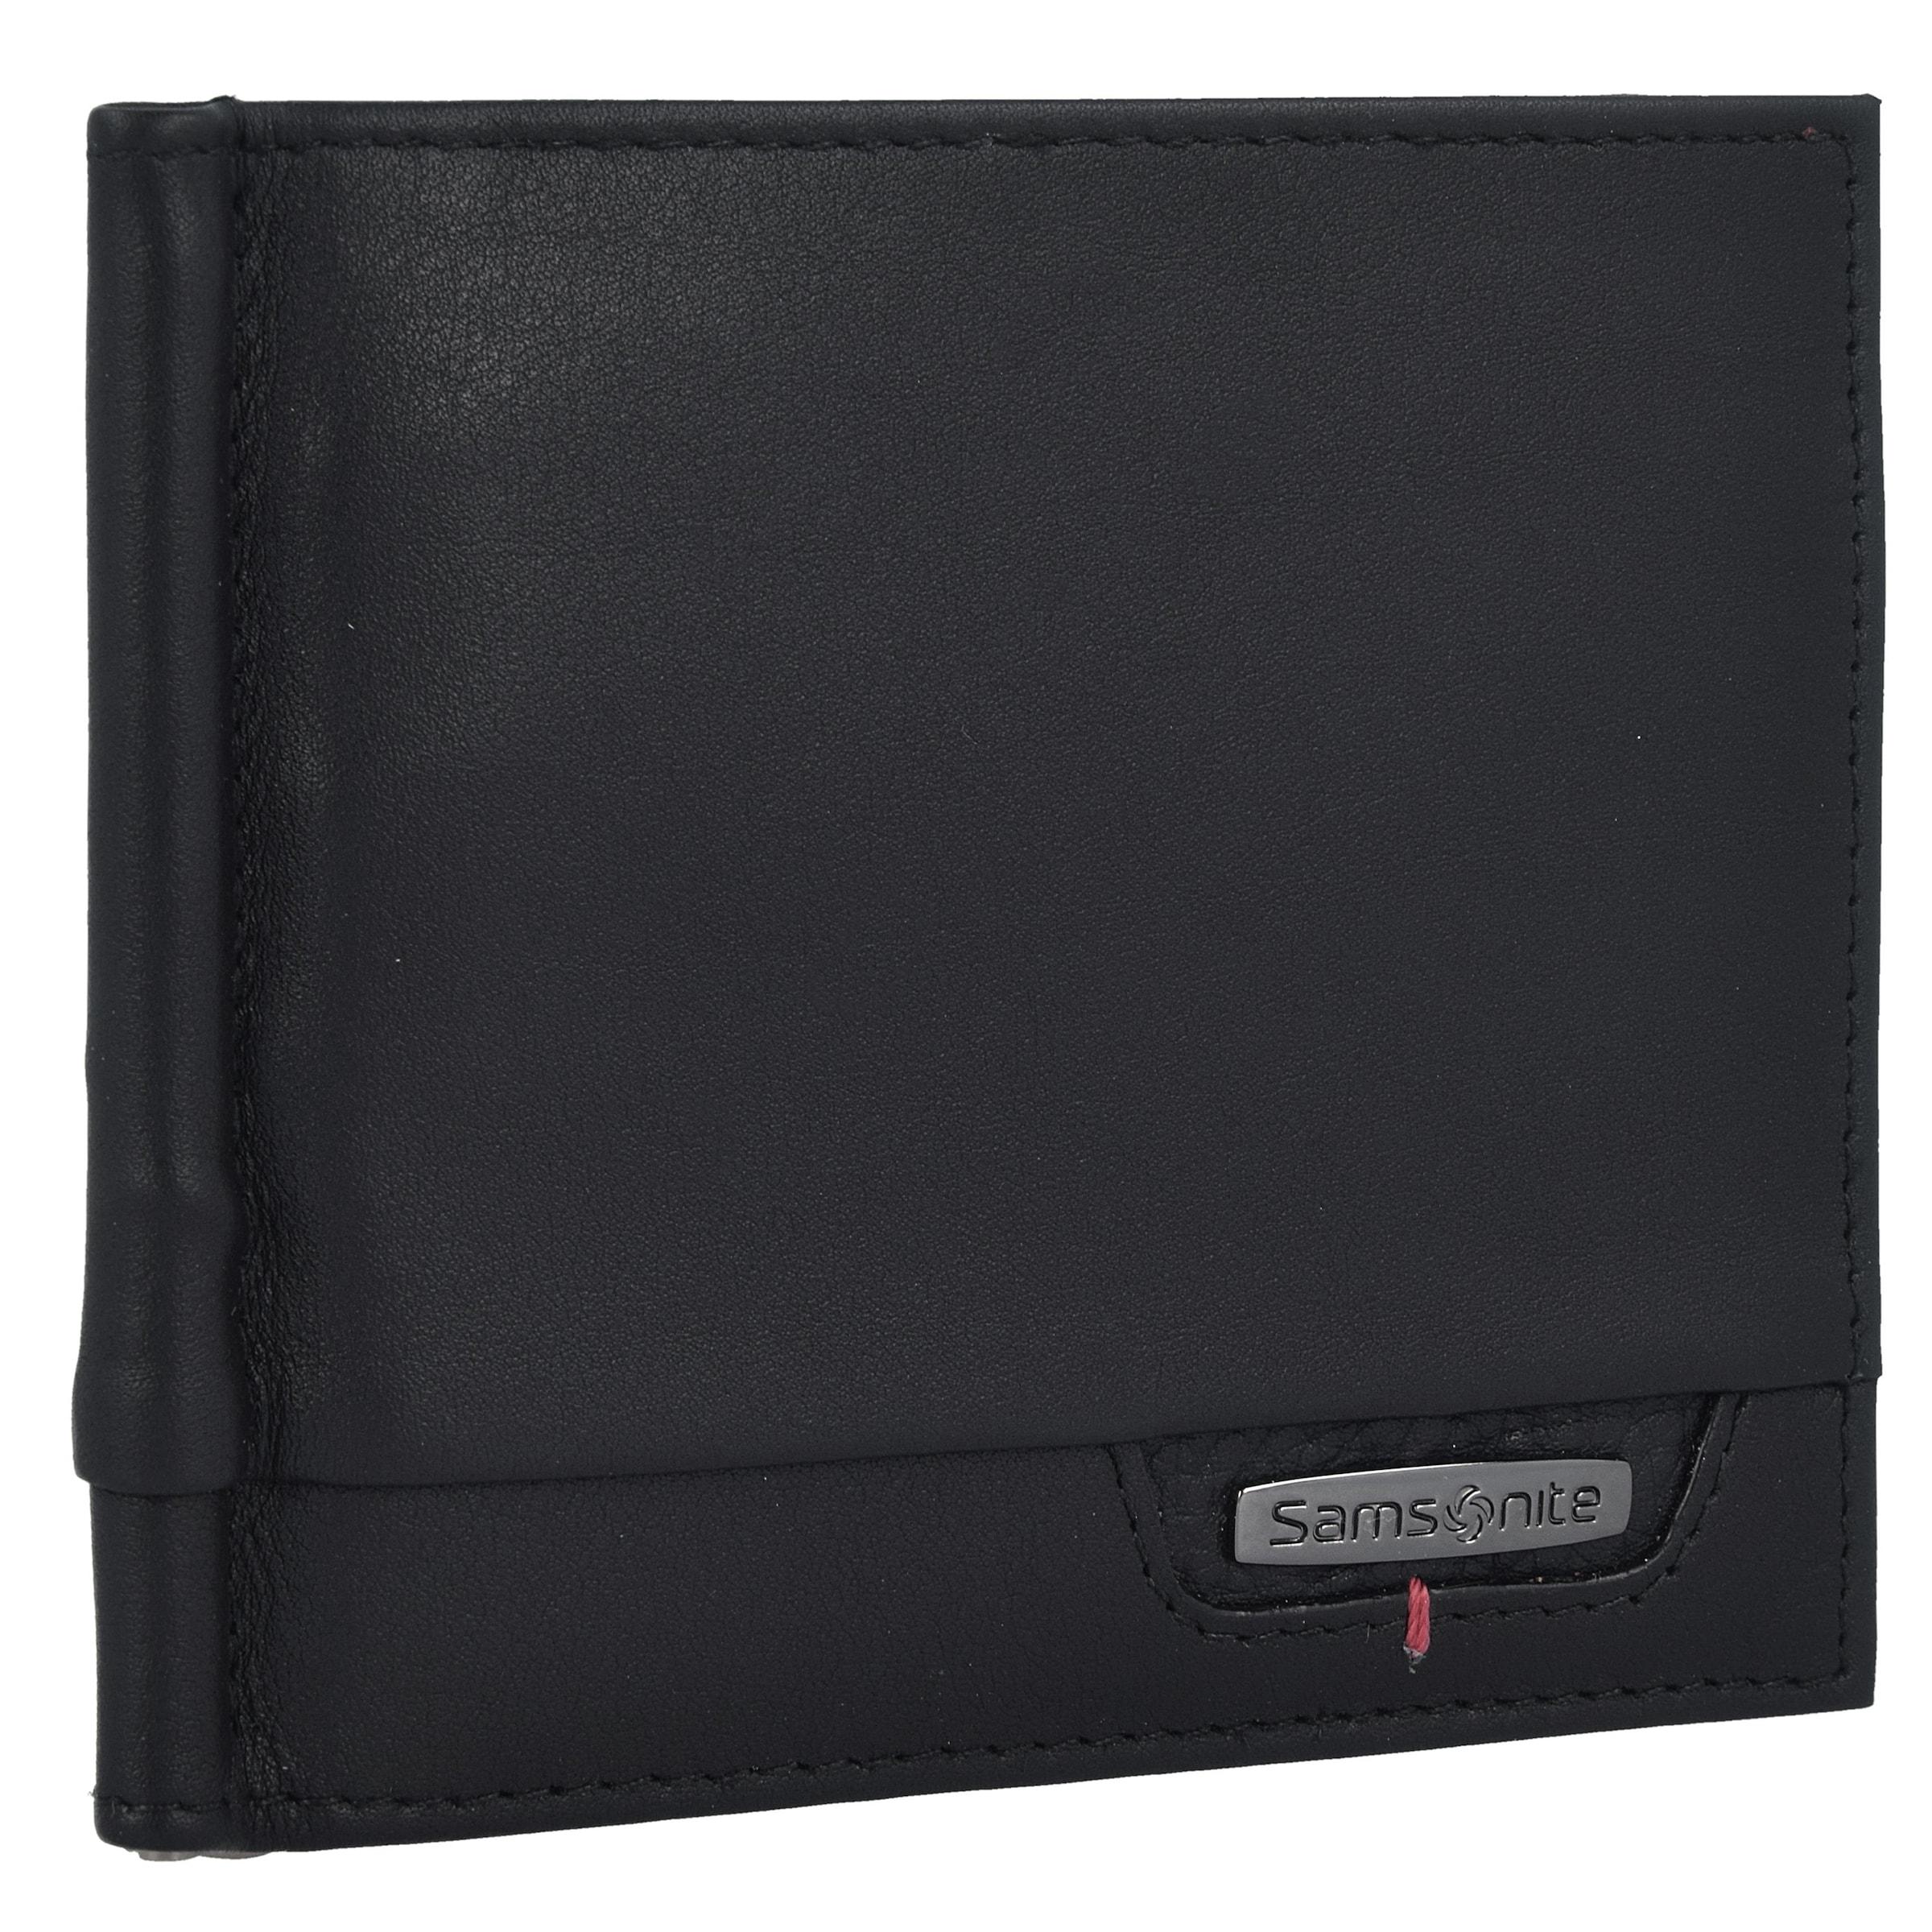 Leder SLG Geldb枚rse DLX cm 11 5 Pro SAMSONITE RFID twxXERnq